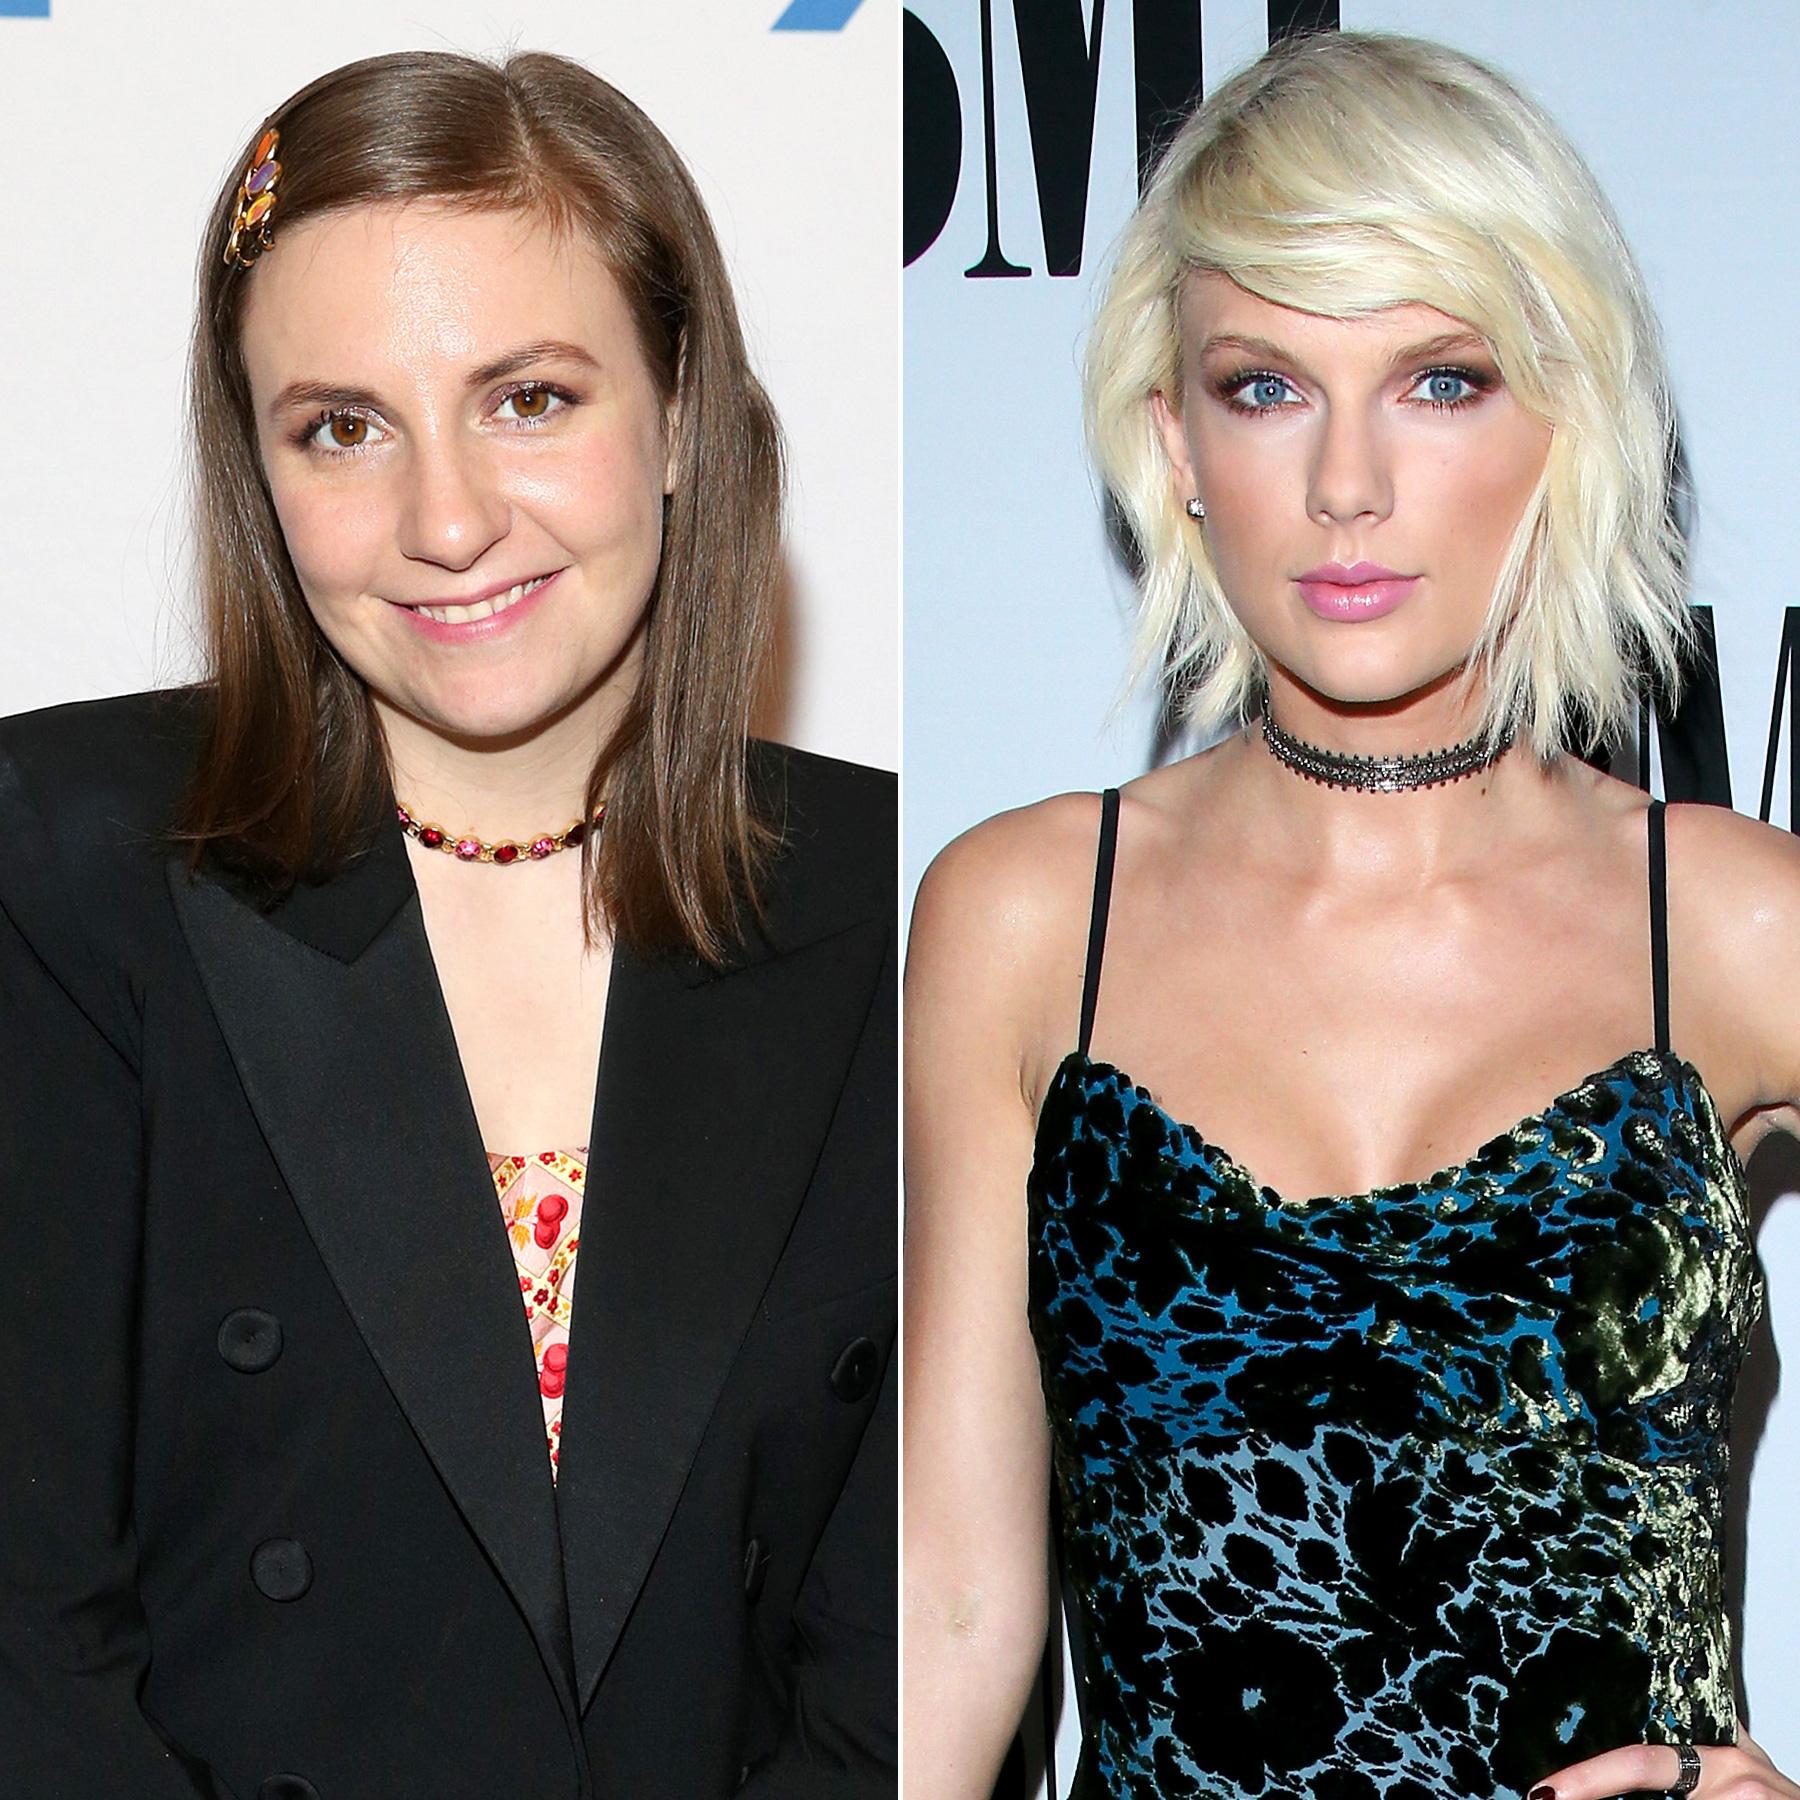 Lena Dunham and Taylor Swift